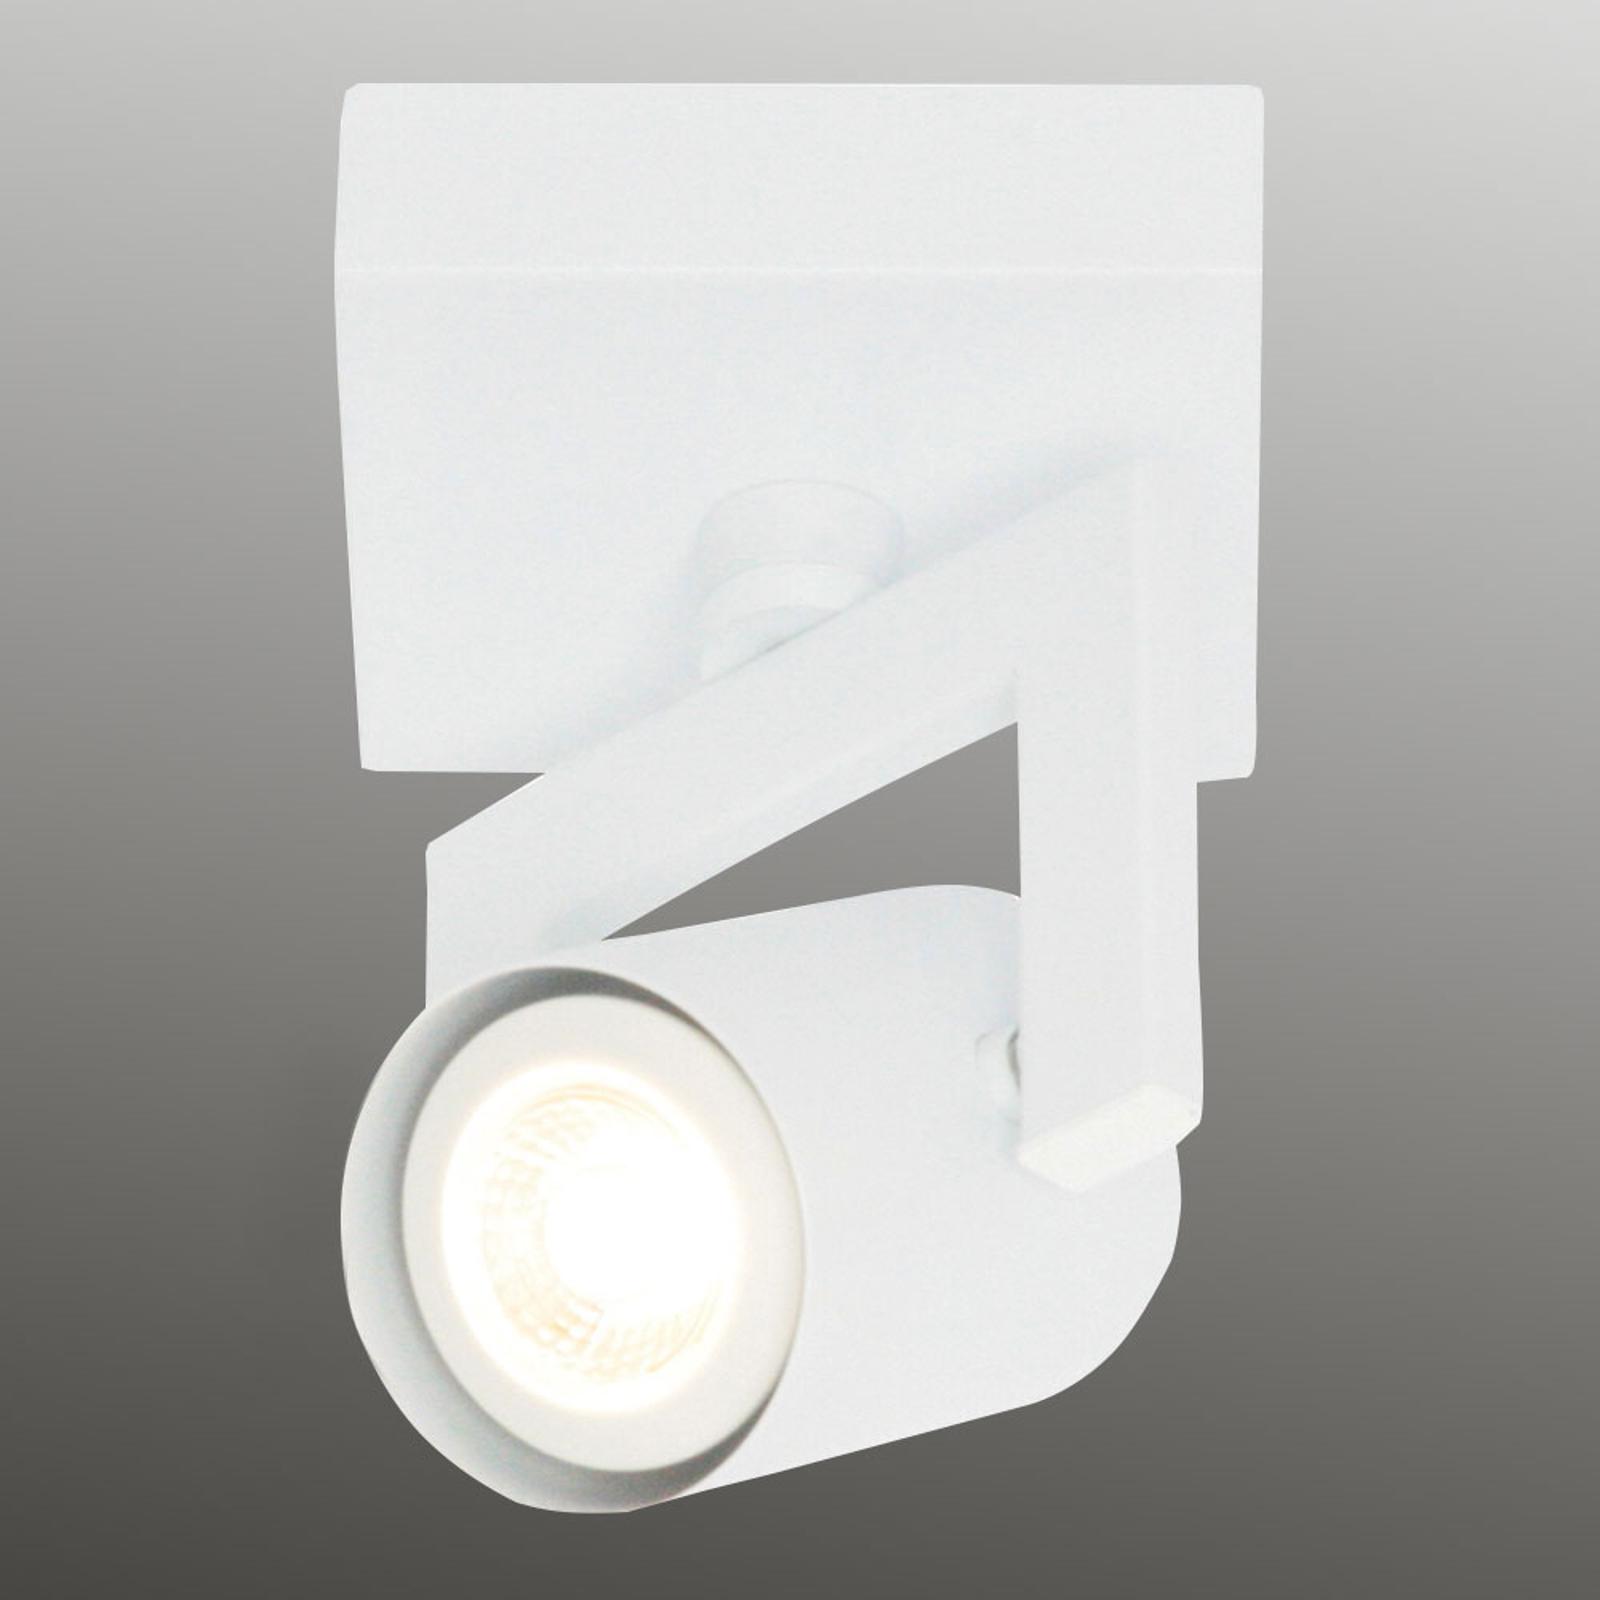 Hvit taklampe Valvo LED, 1 lyskilde